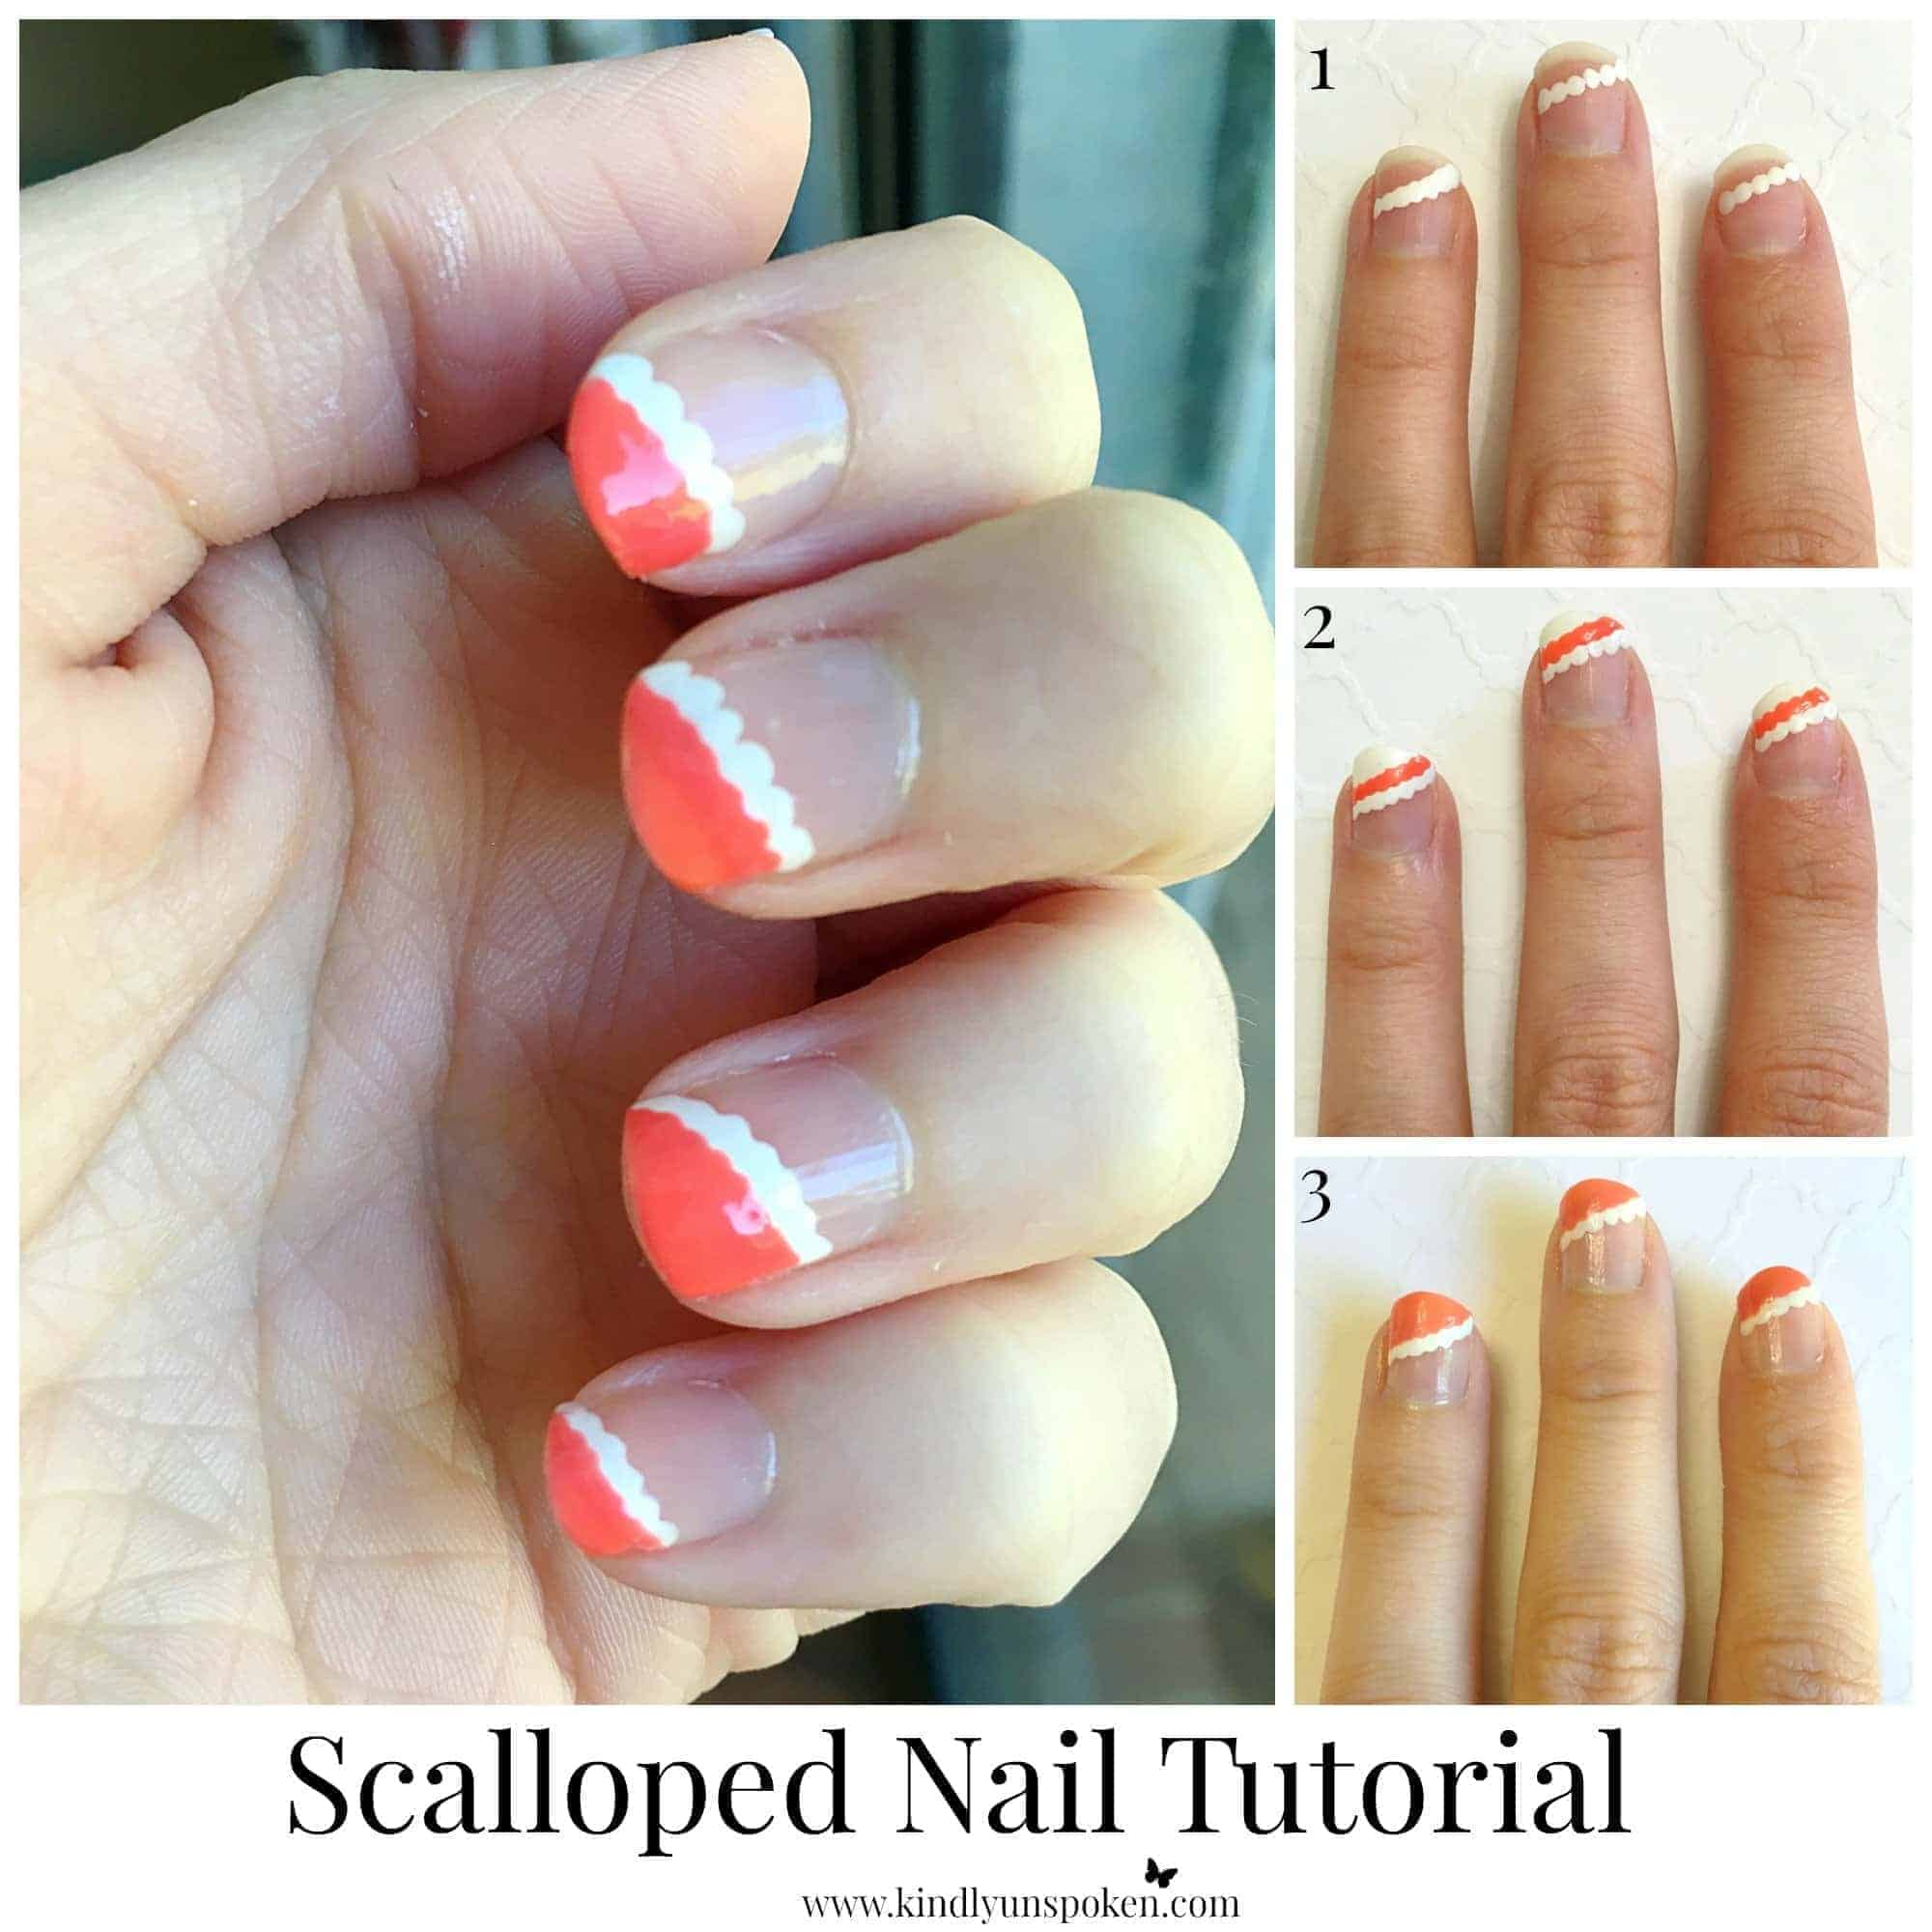 Christmas Nails Tutorial Youtube: Scalloped Nail Tutorial